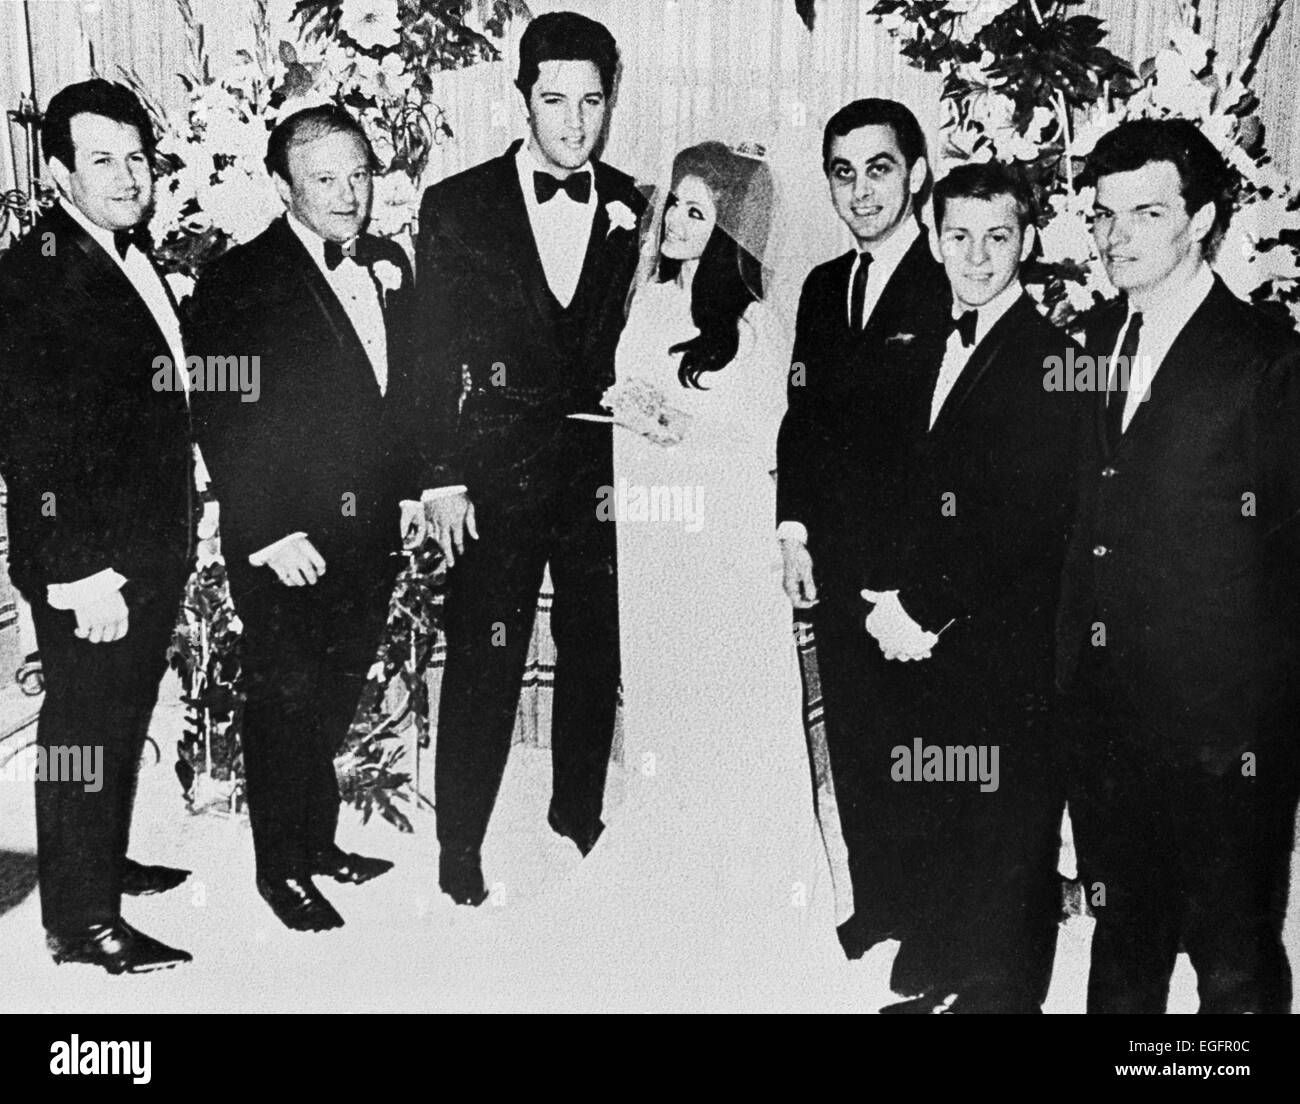 LAS VEGAS, NV - NOVEMBER 10 – Elvis and Priscilla Presley Wedding at the Aladdin Hotel, Las Vegas, Nevada, on November - Stock Image